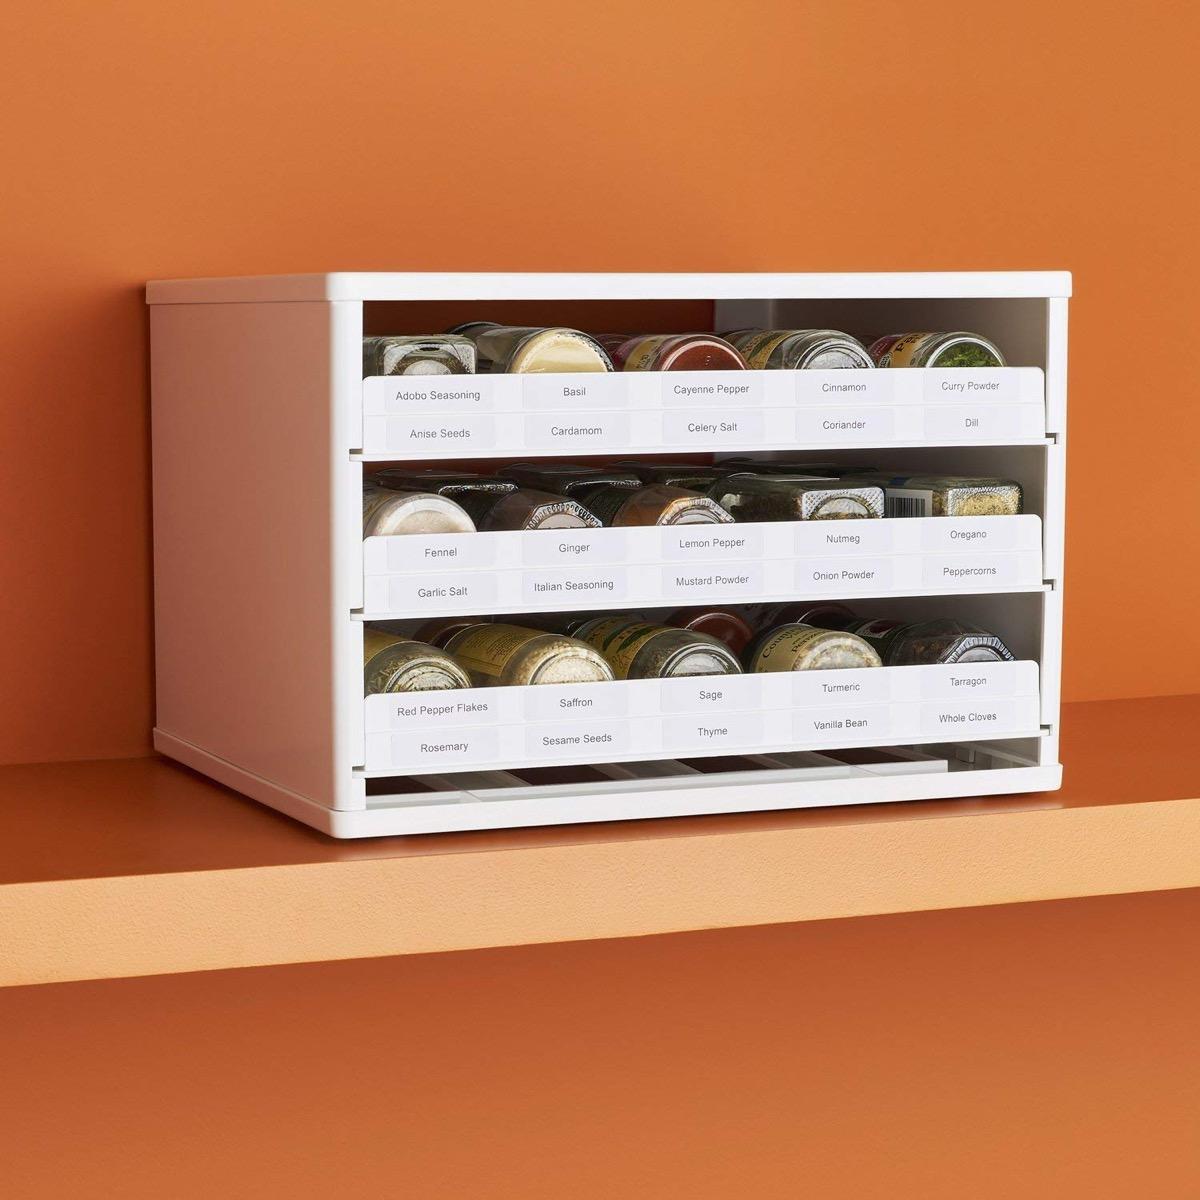 Spices Organizer {Organizational Products on Amazon}